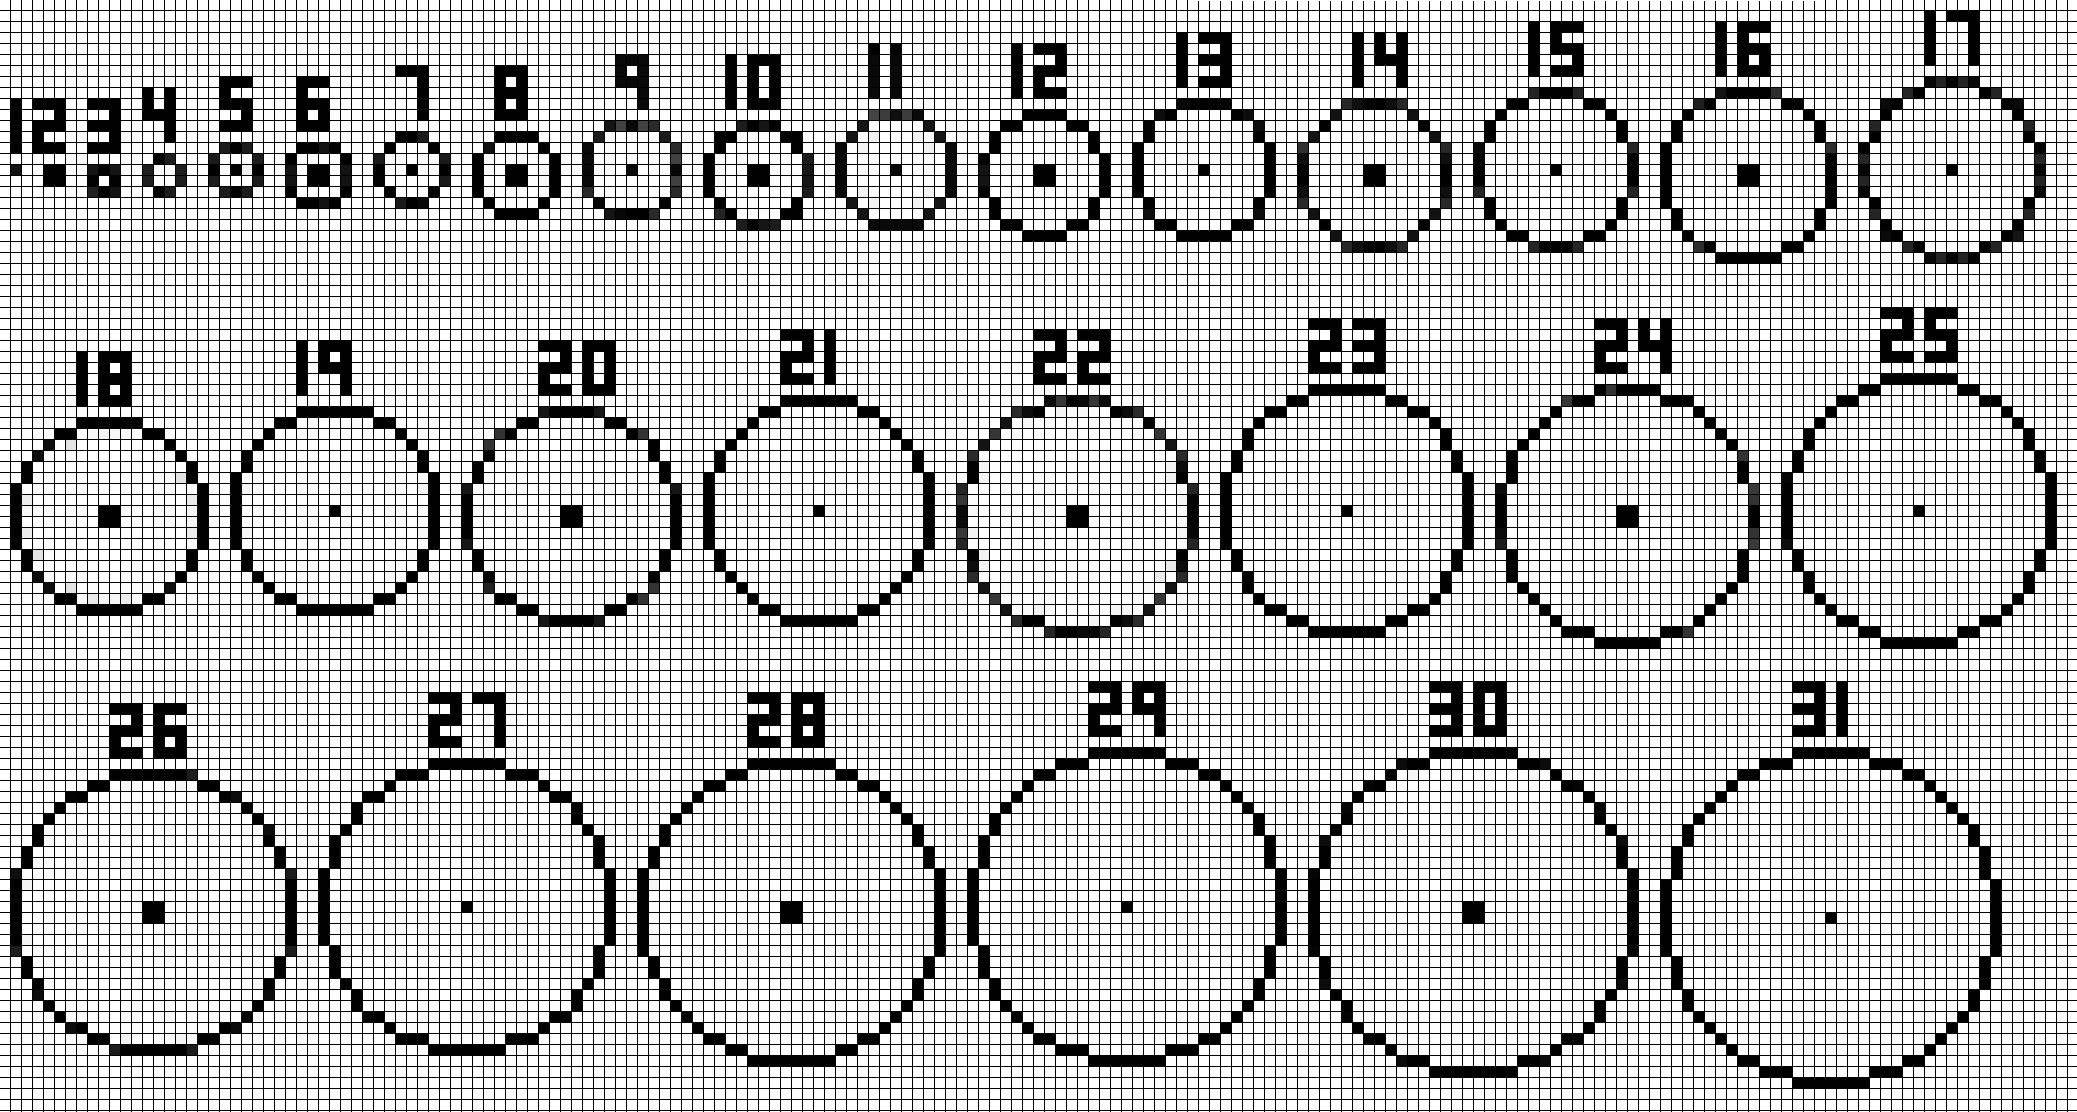 New circle guide, 1-31. Even diameters, bigger, no